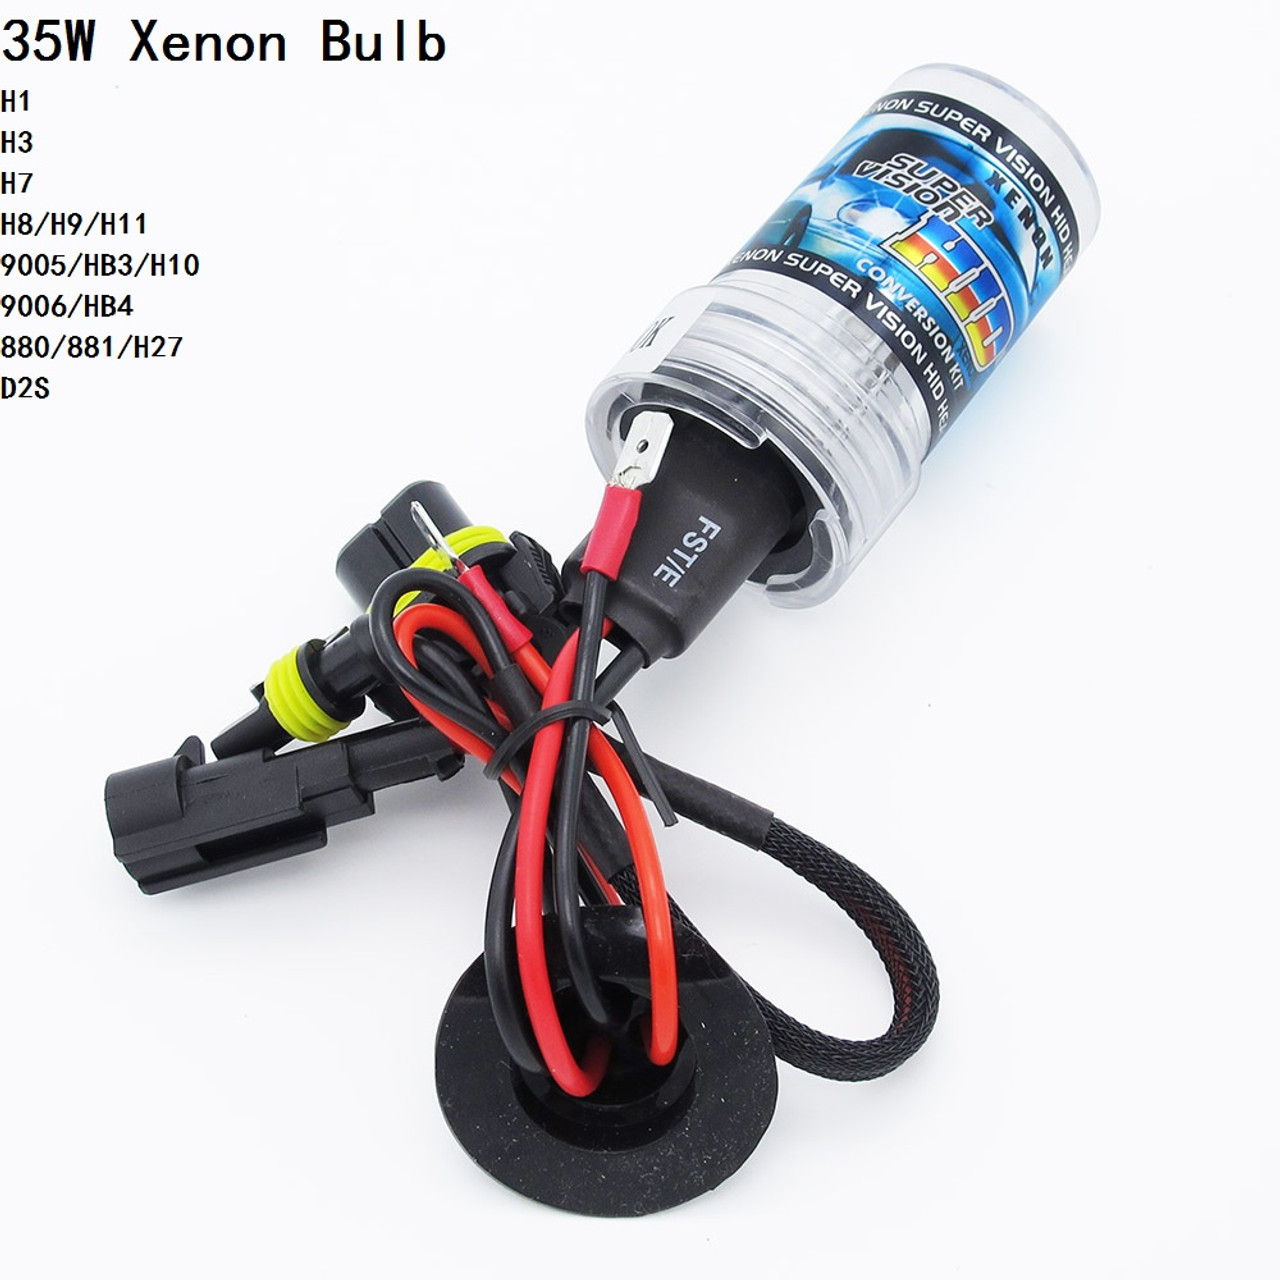 1pc H1 H3 H7 H11 9005 9006 D2S 12V 35W HID Xenon Bulb Auto Car Headlight